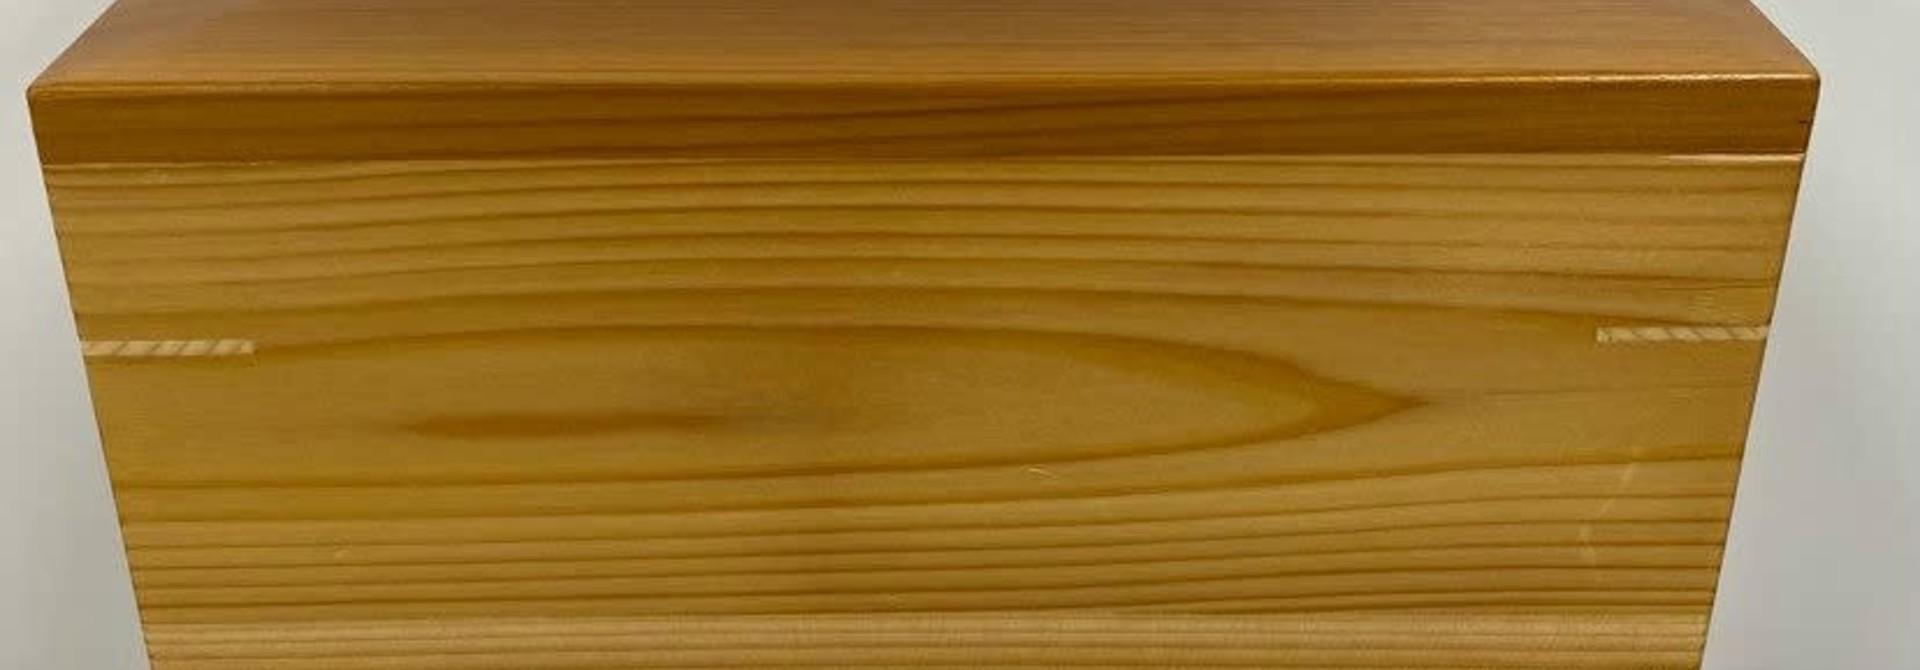 Urn box - Red Cedar